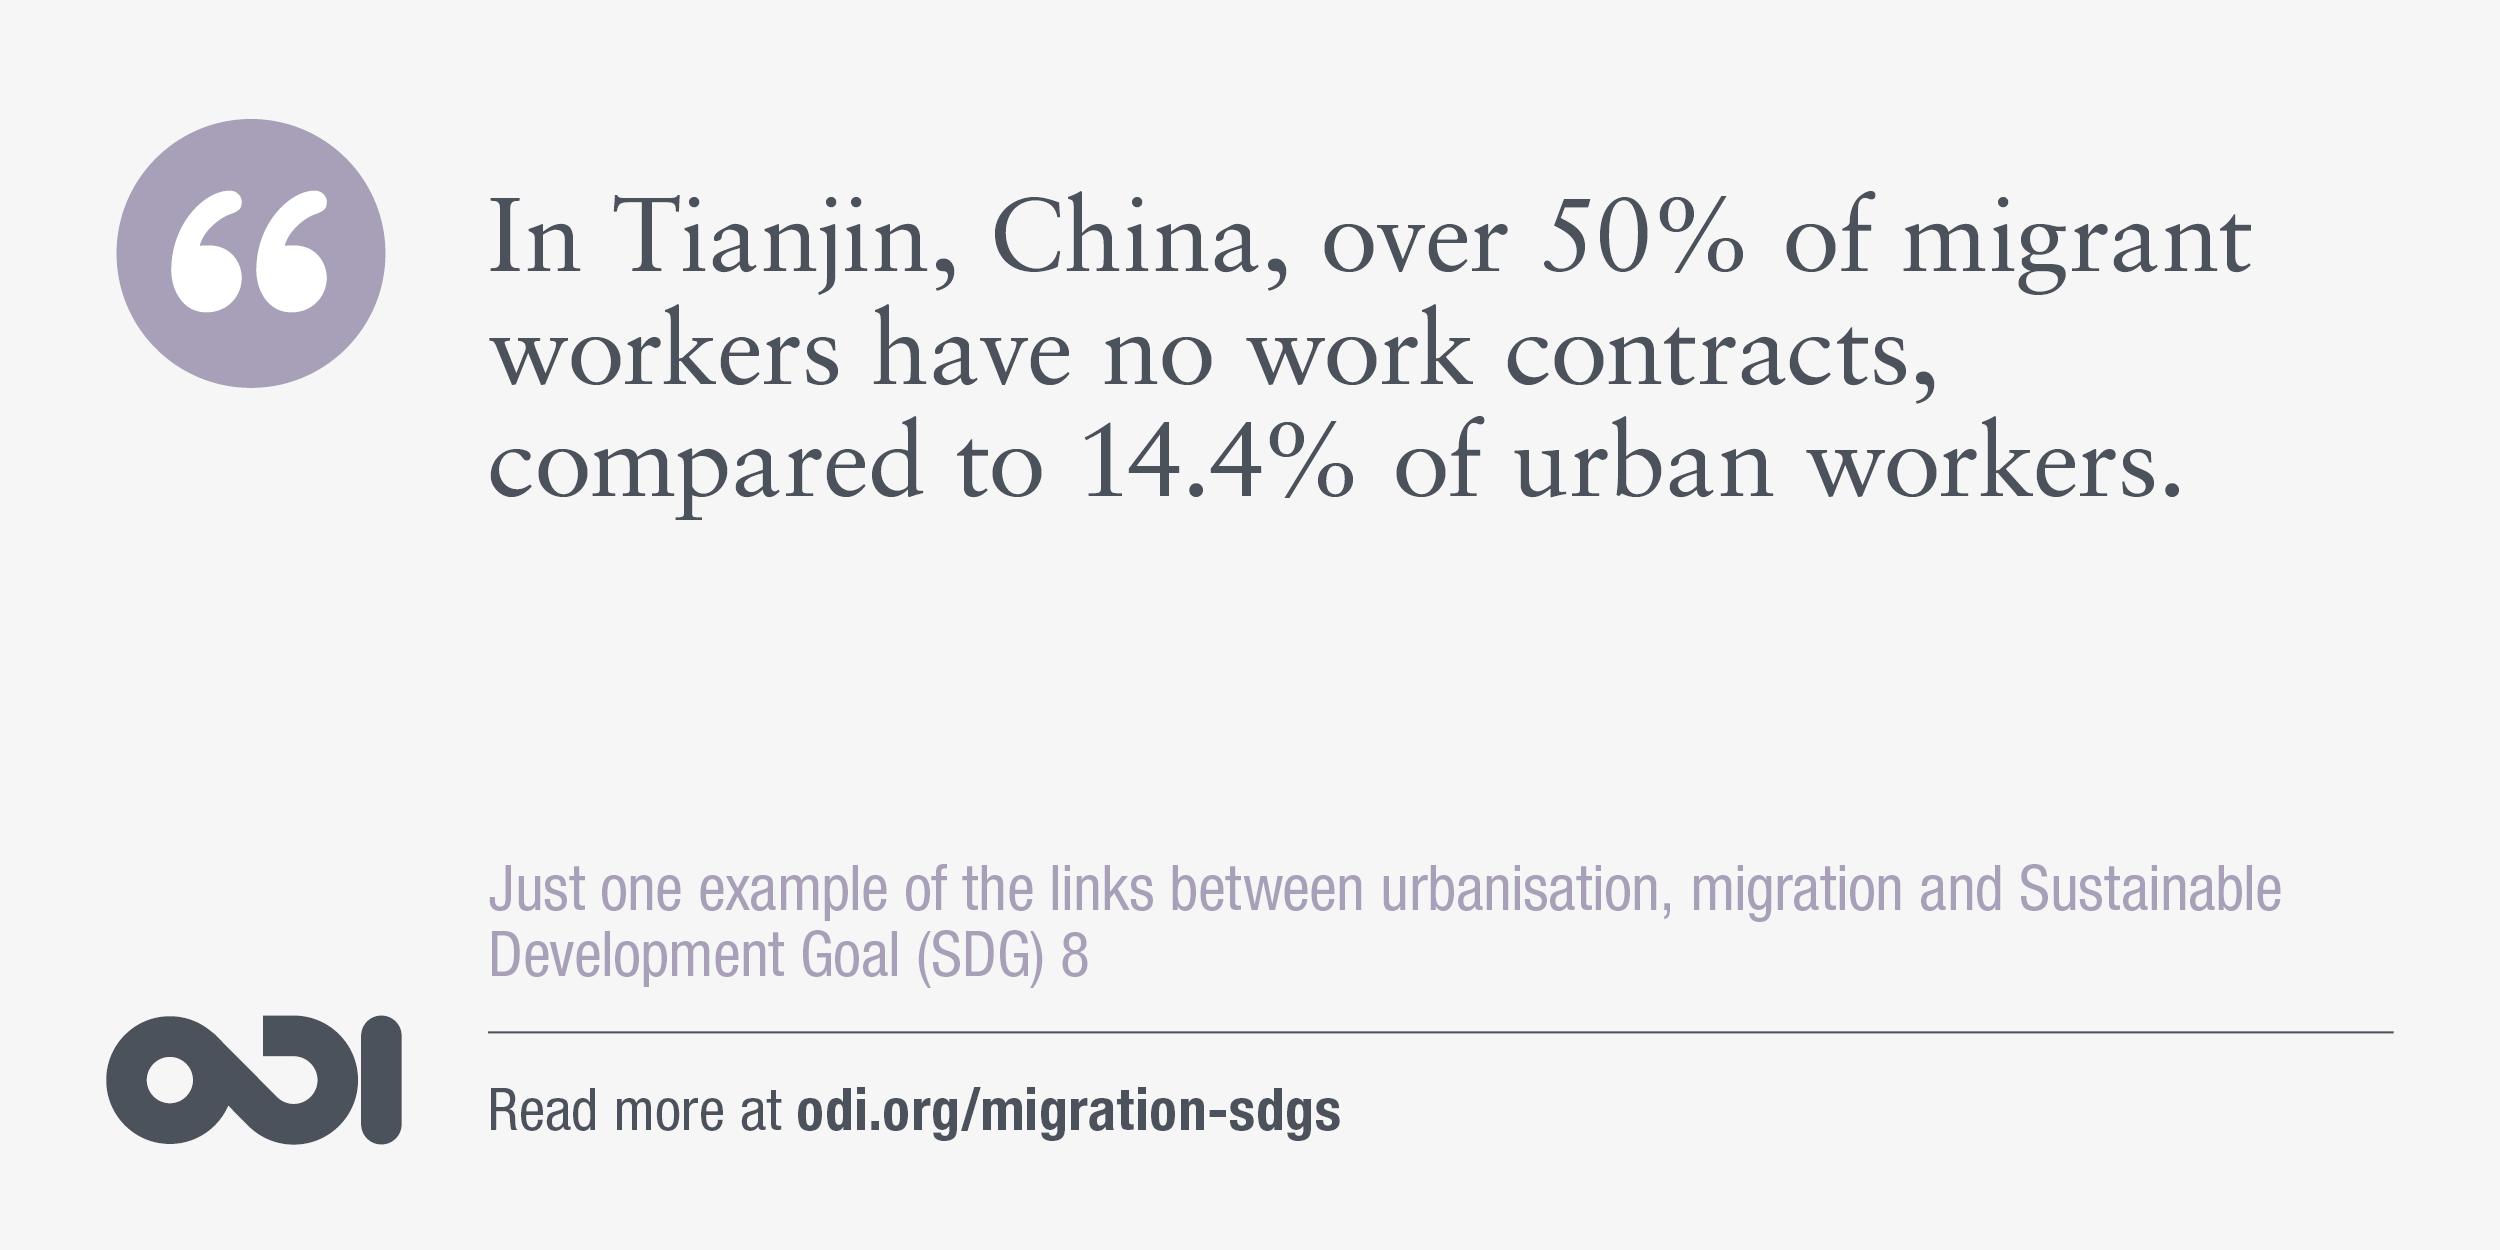 The links between urbanisation, migration and SDG 8.